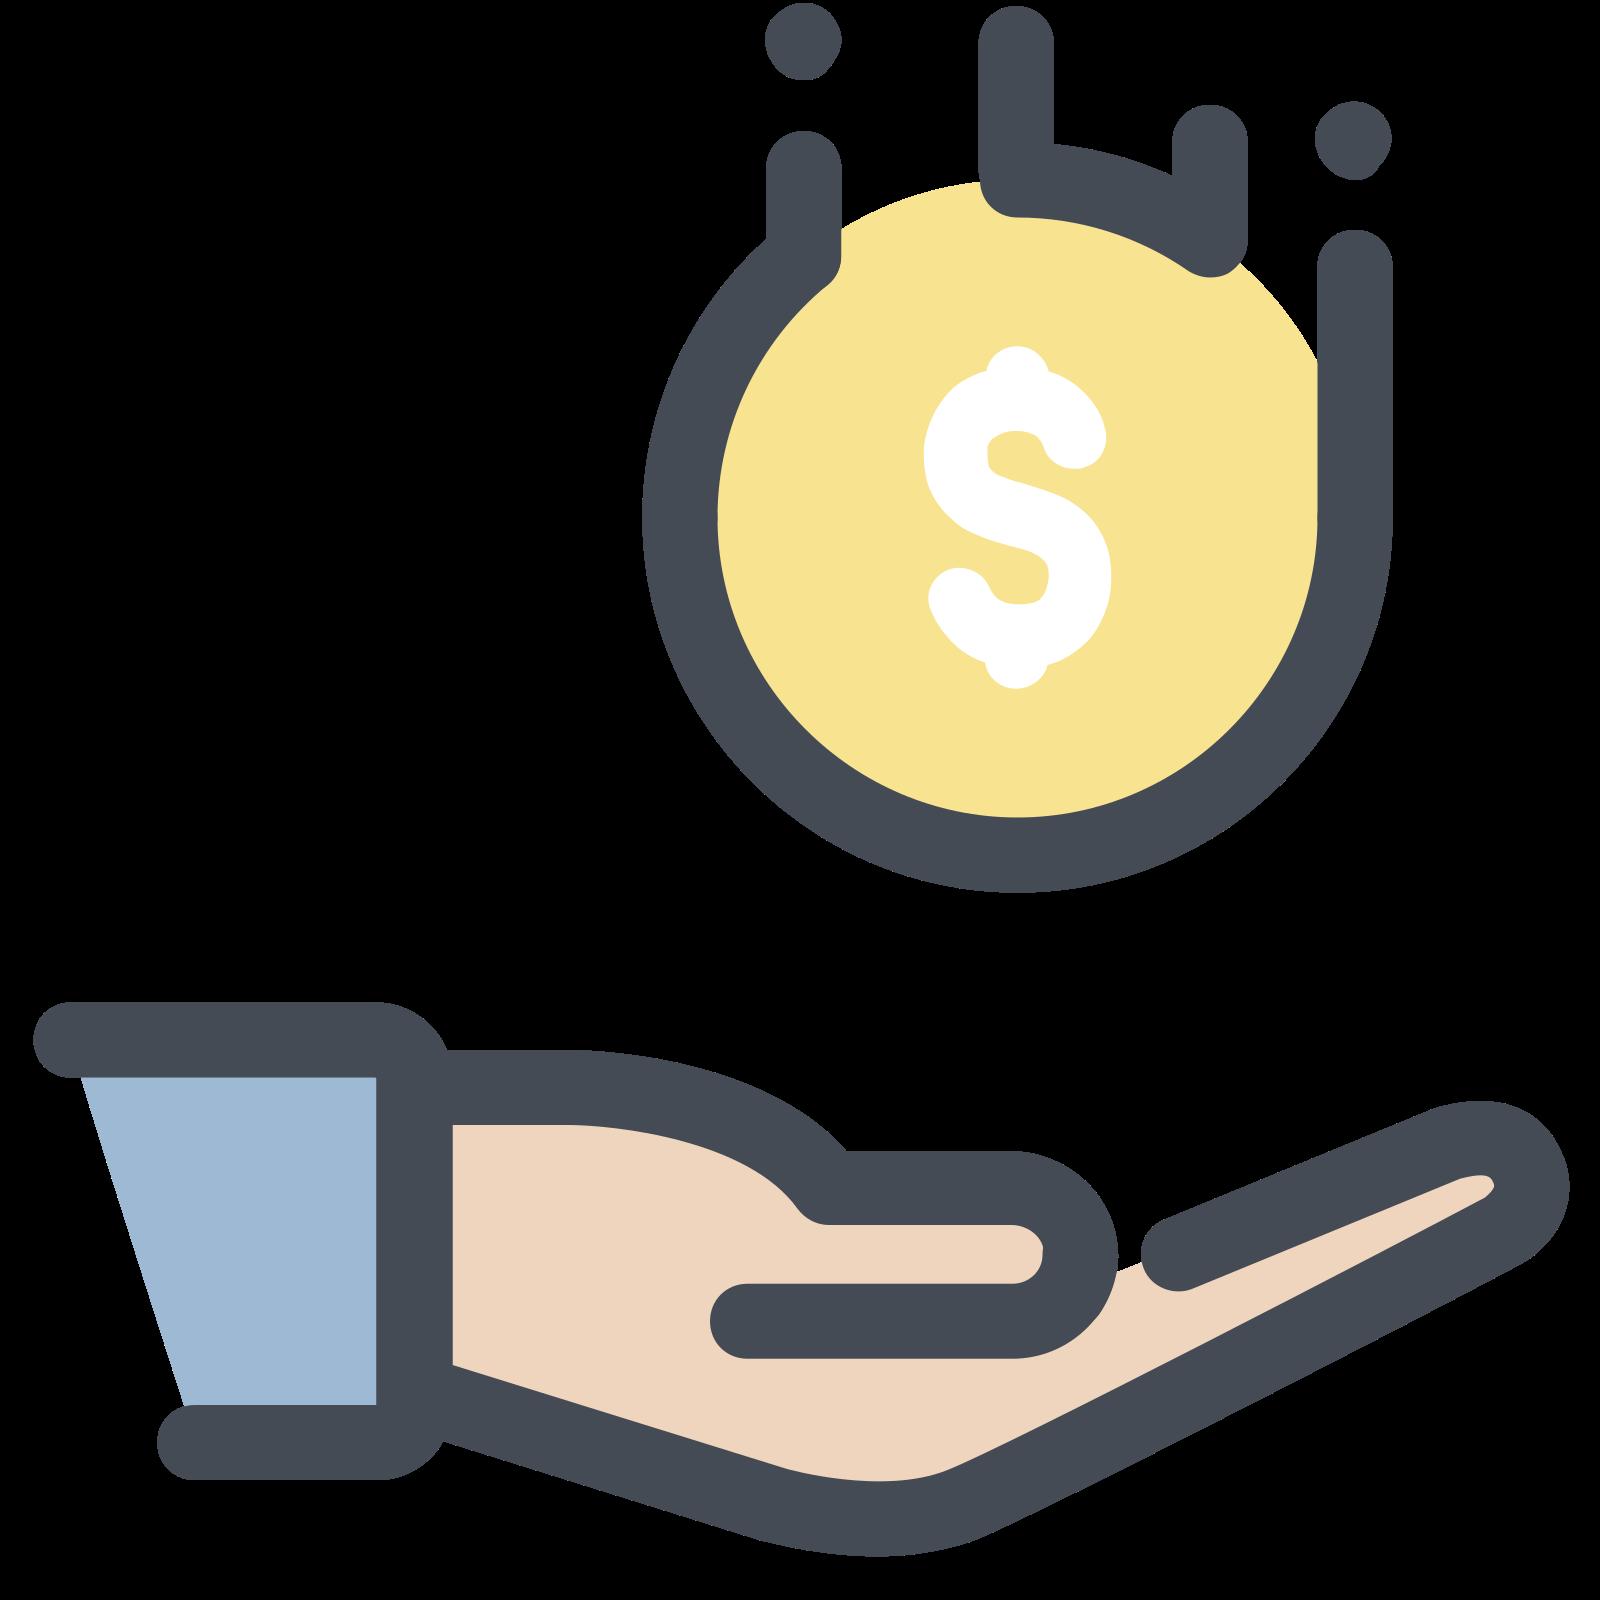 Receive Dollar icon